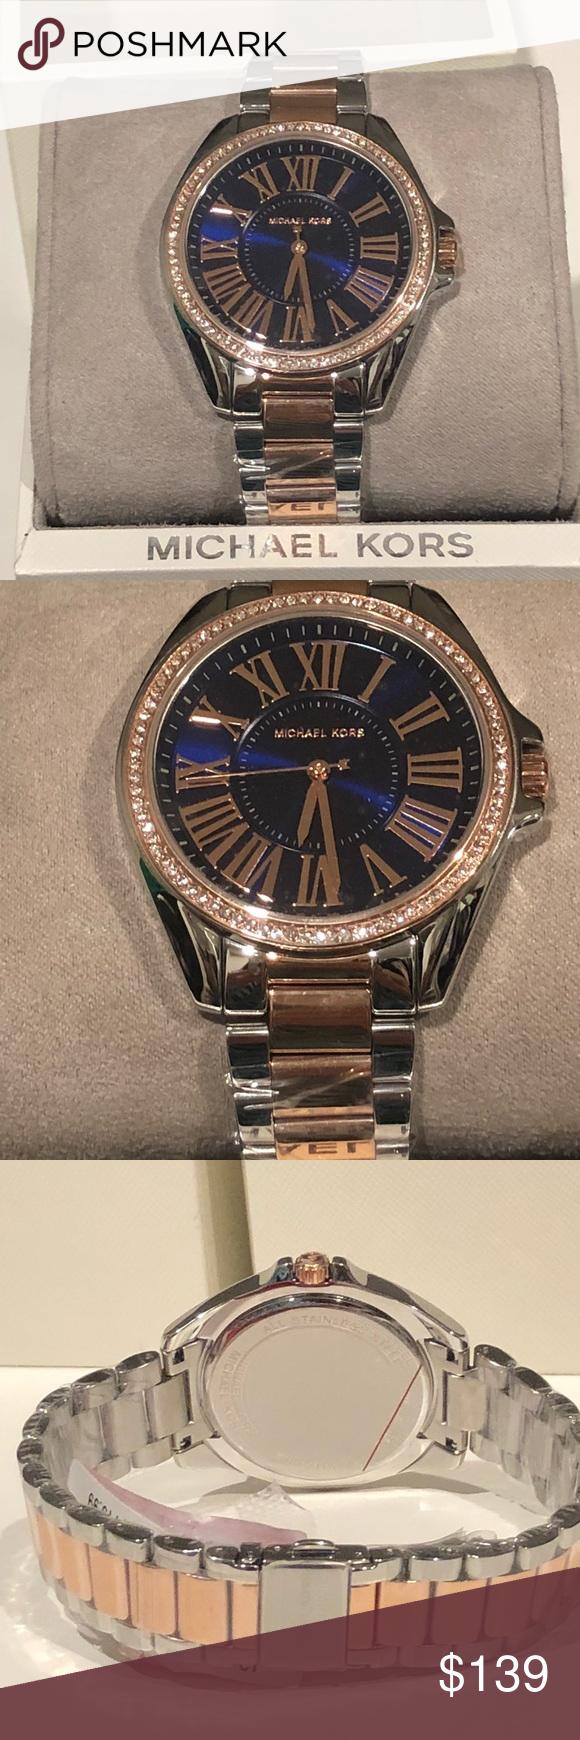 New Authentic women's Bradshaw watch 🌟 NWT Michael kors